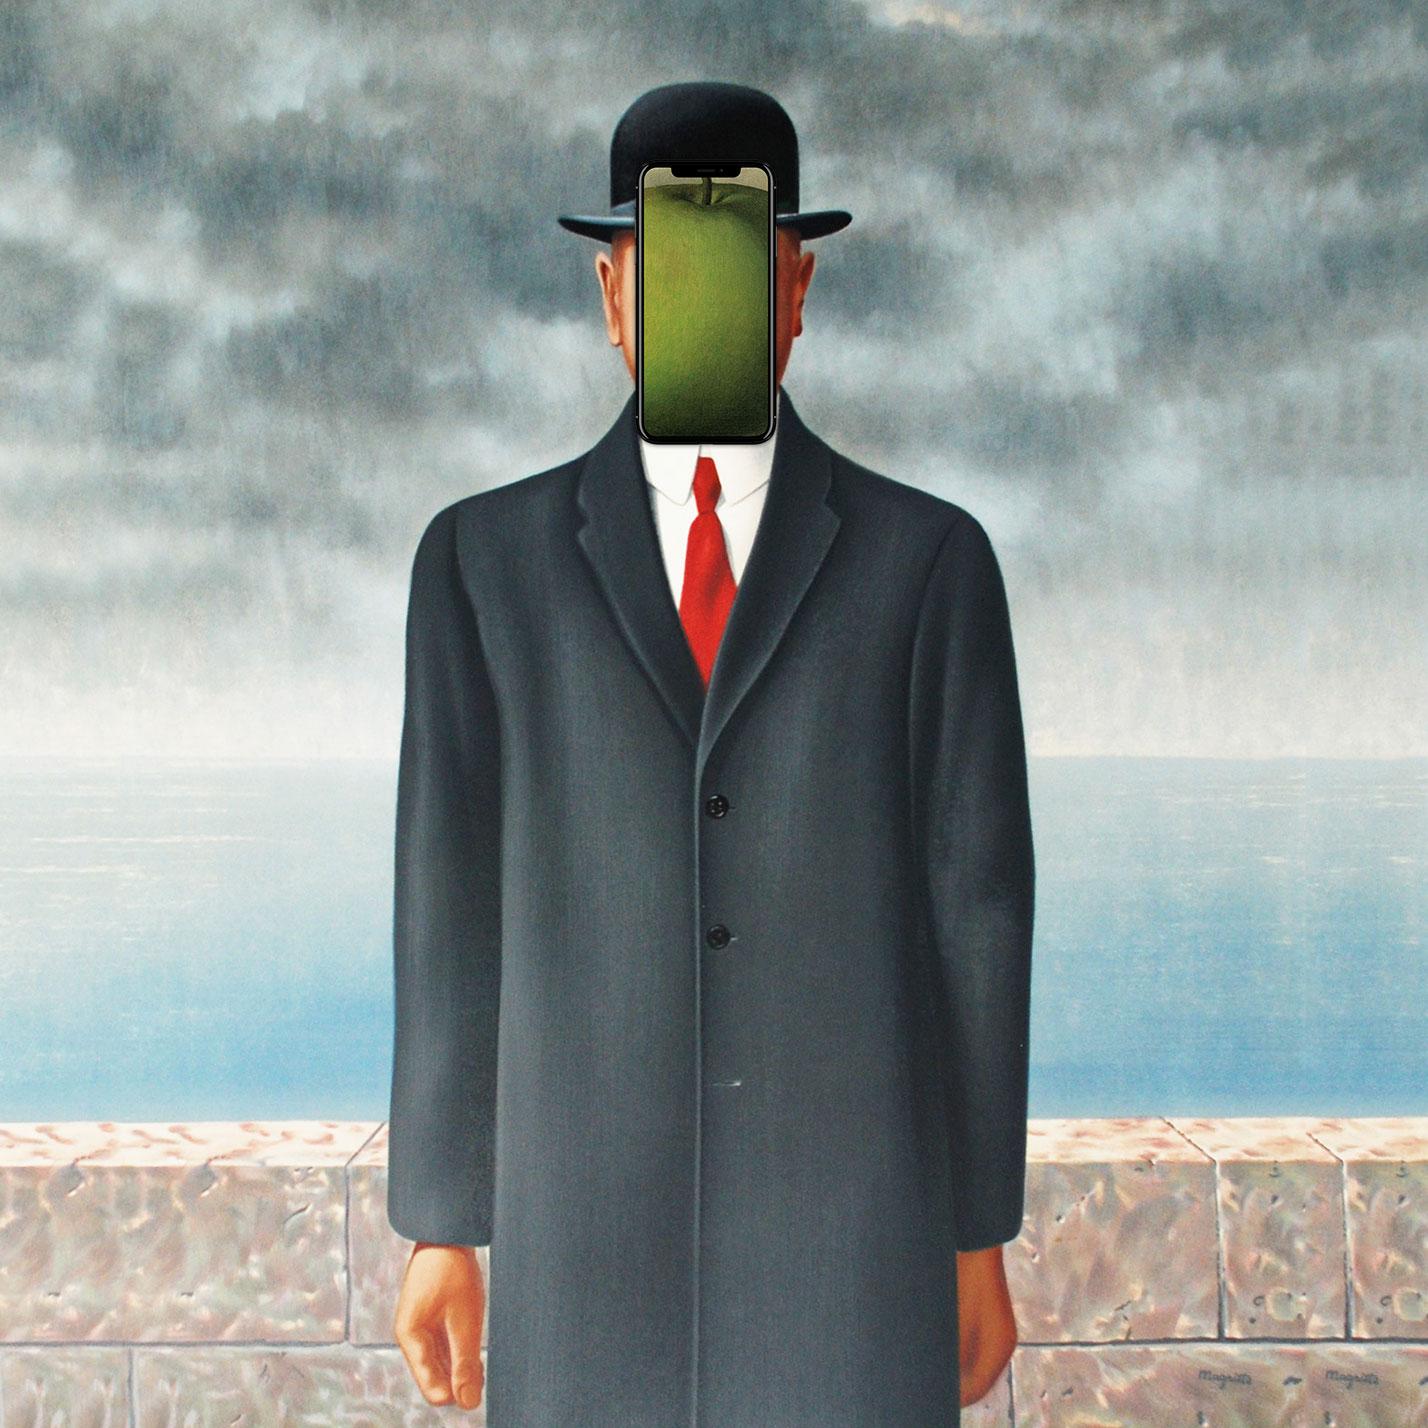 apple of man (pseudoriginal artwork, 2018)